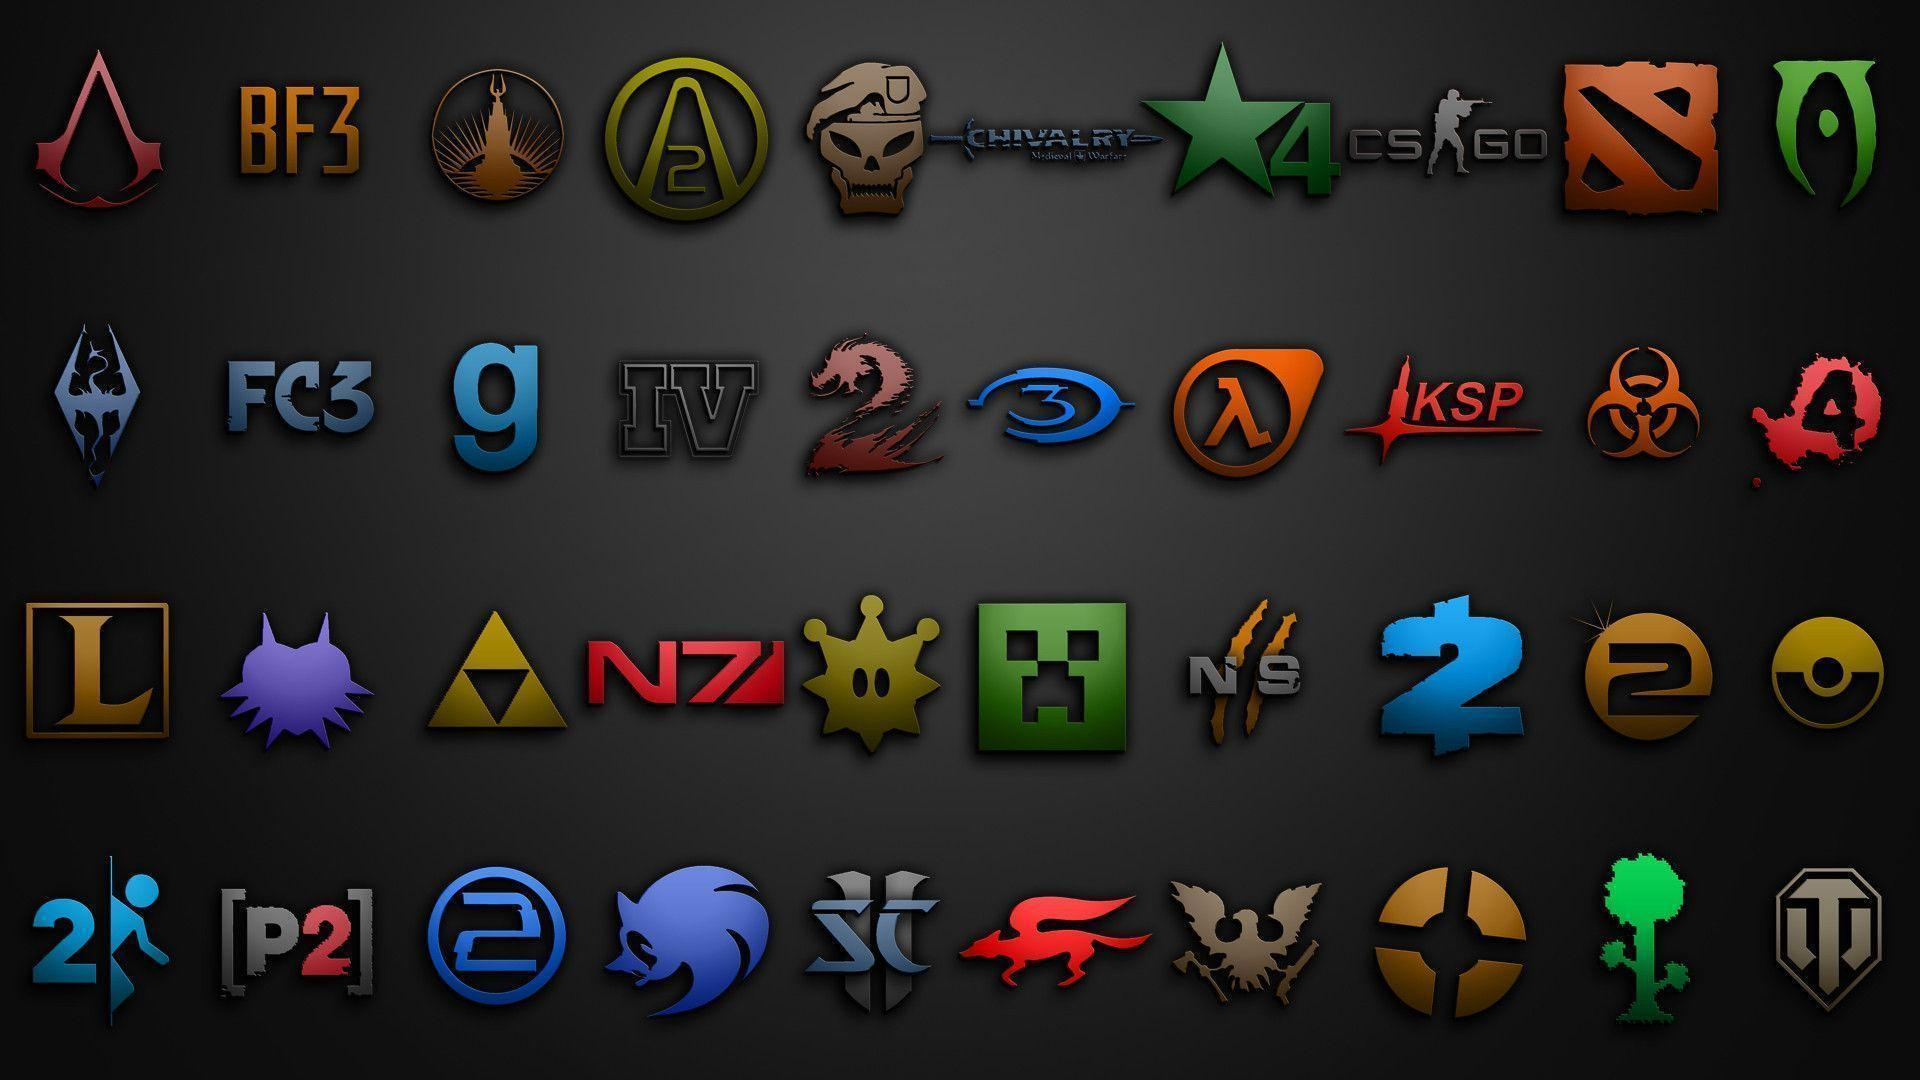 Gamer Logo Wallpapers Top Free Gamer Logo Backgrounds